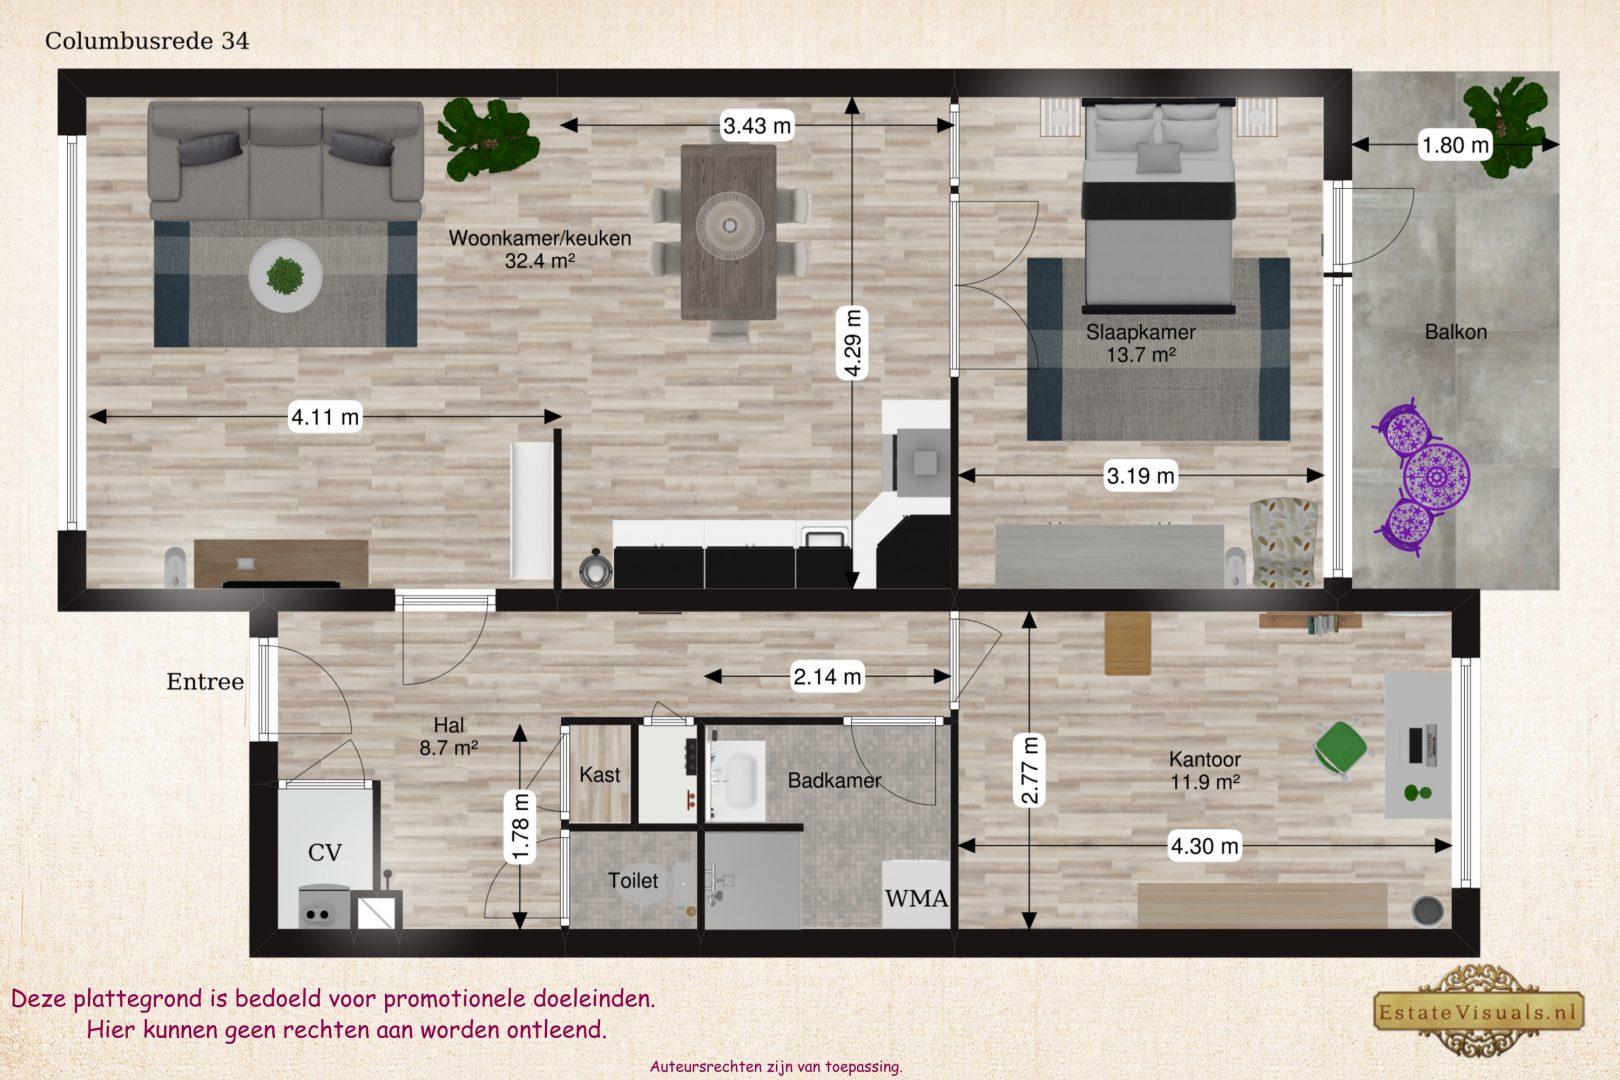 Floorplan 2D Columbusrede 34, Zoetermeer